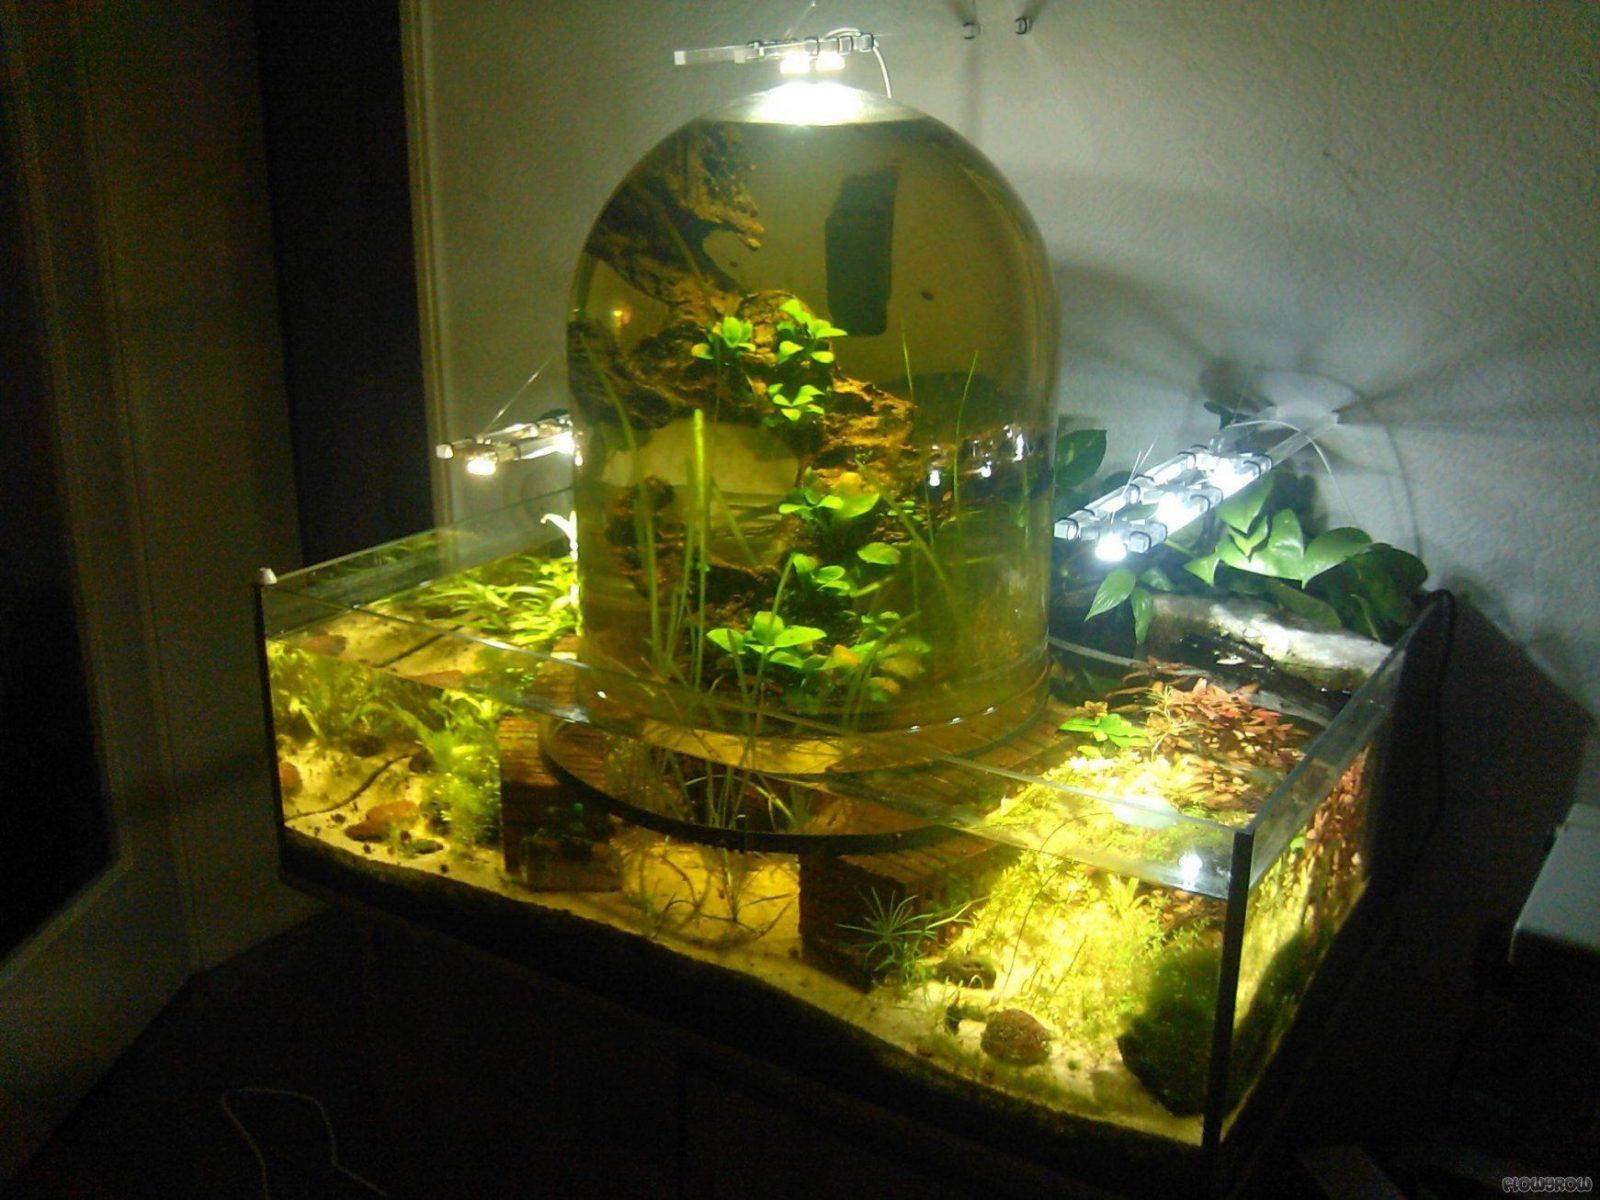 Led Grow Lampe Selber Bauen Led Grow Lampe Selber Bauen Einzigartig von Led Panel Selber Bauen Grow Bild